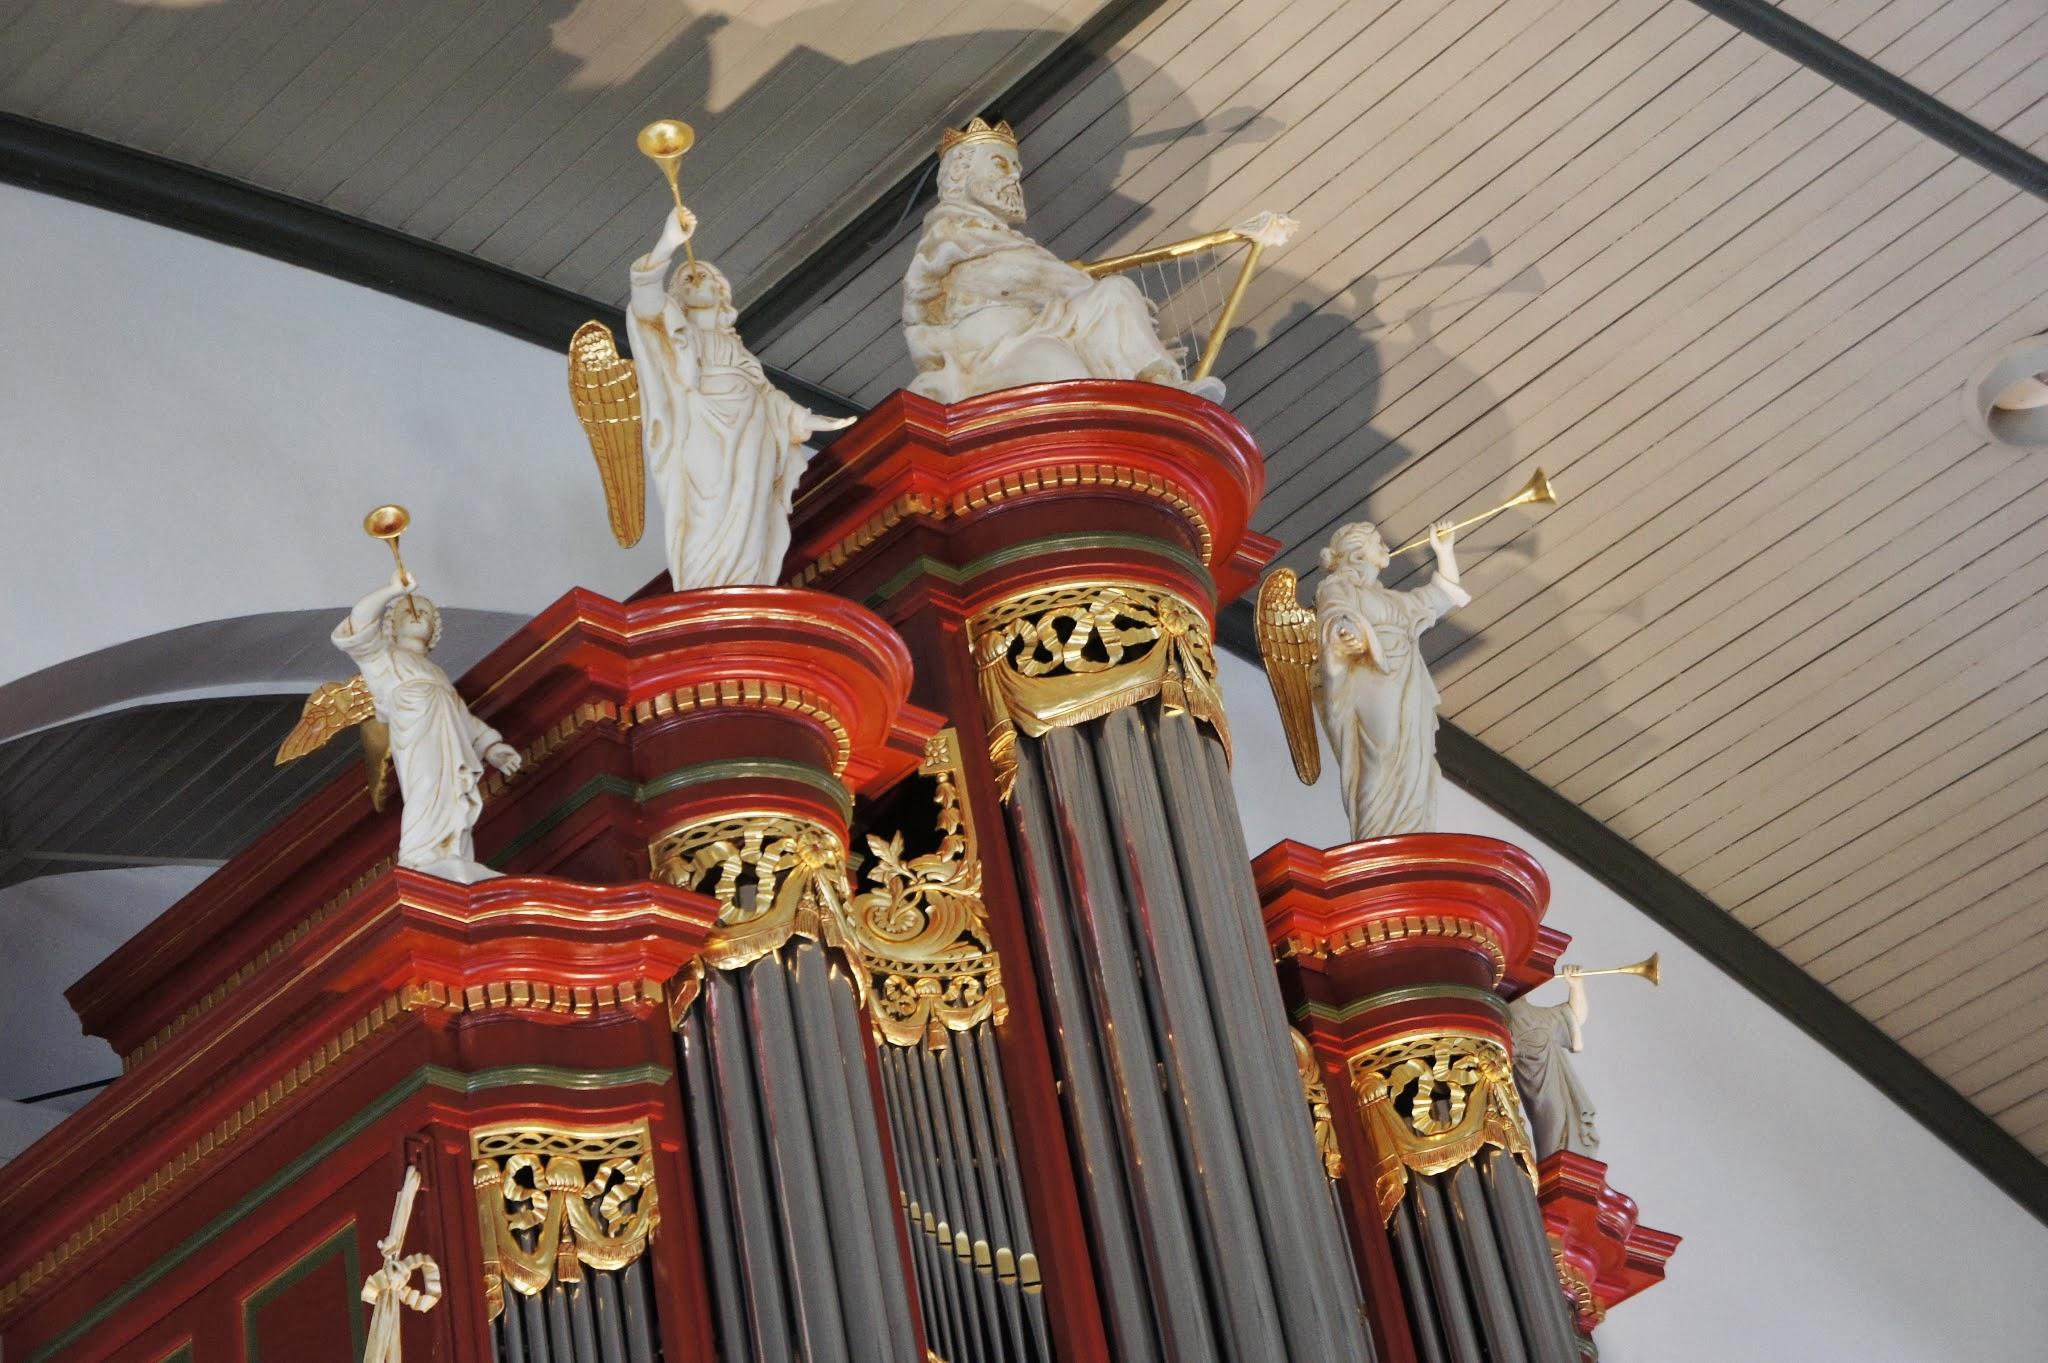 Ga naar alle Kerkorgels op Urk.